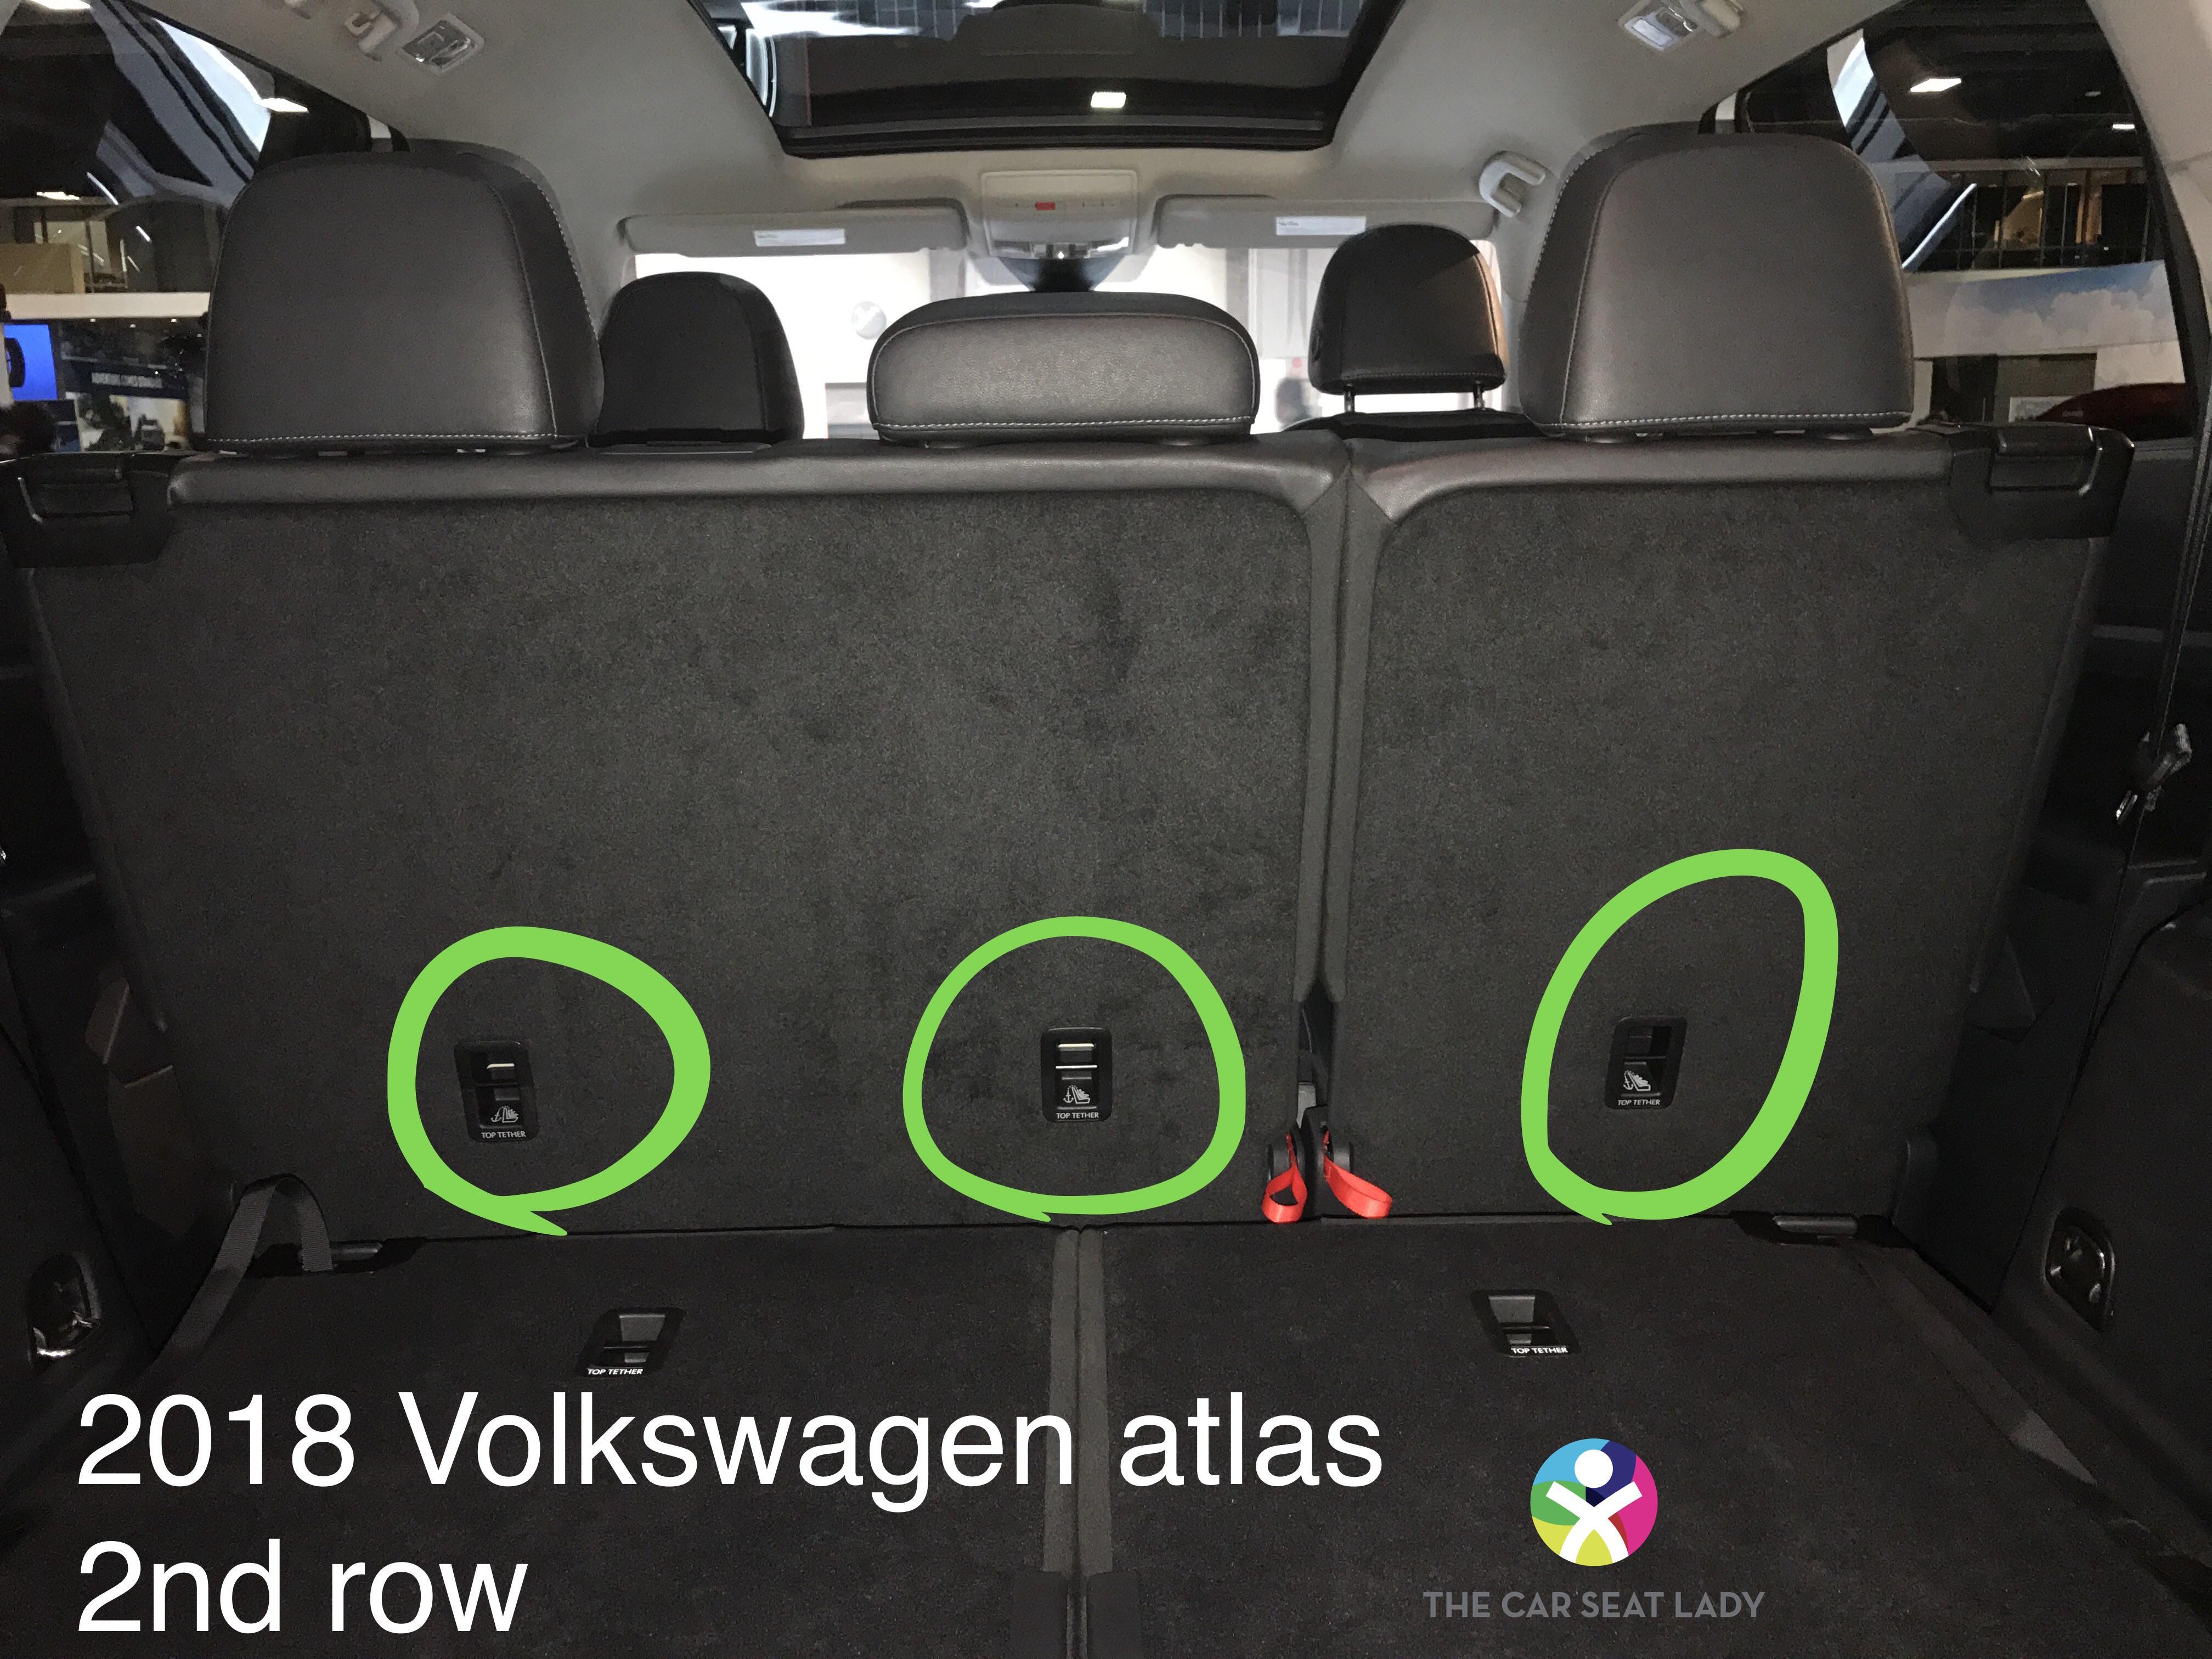 The Car Seat LadyVolkswagen Atlas  The Car Seat Lady